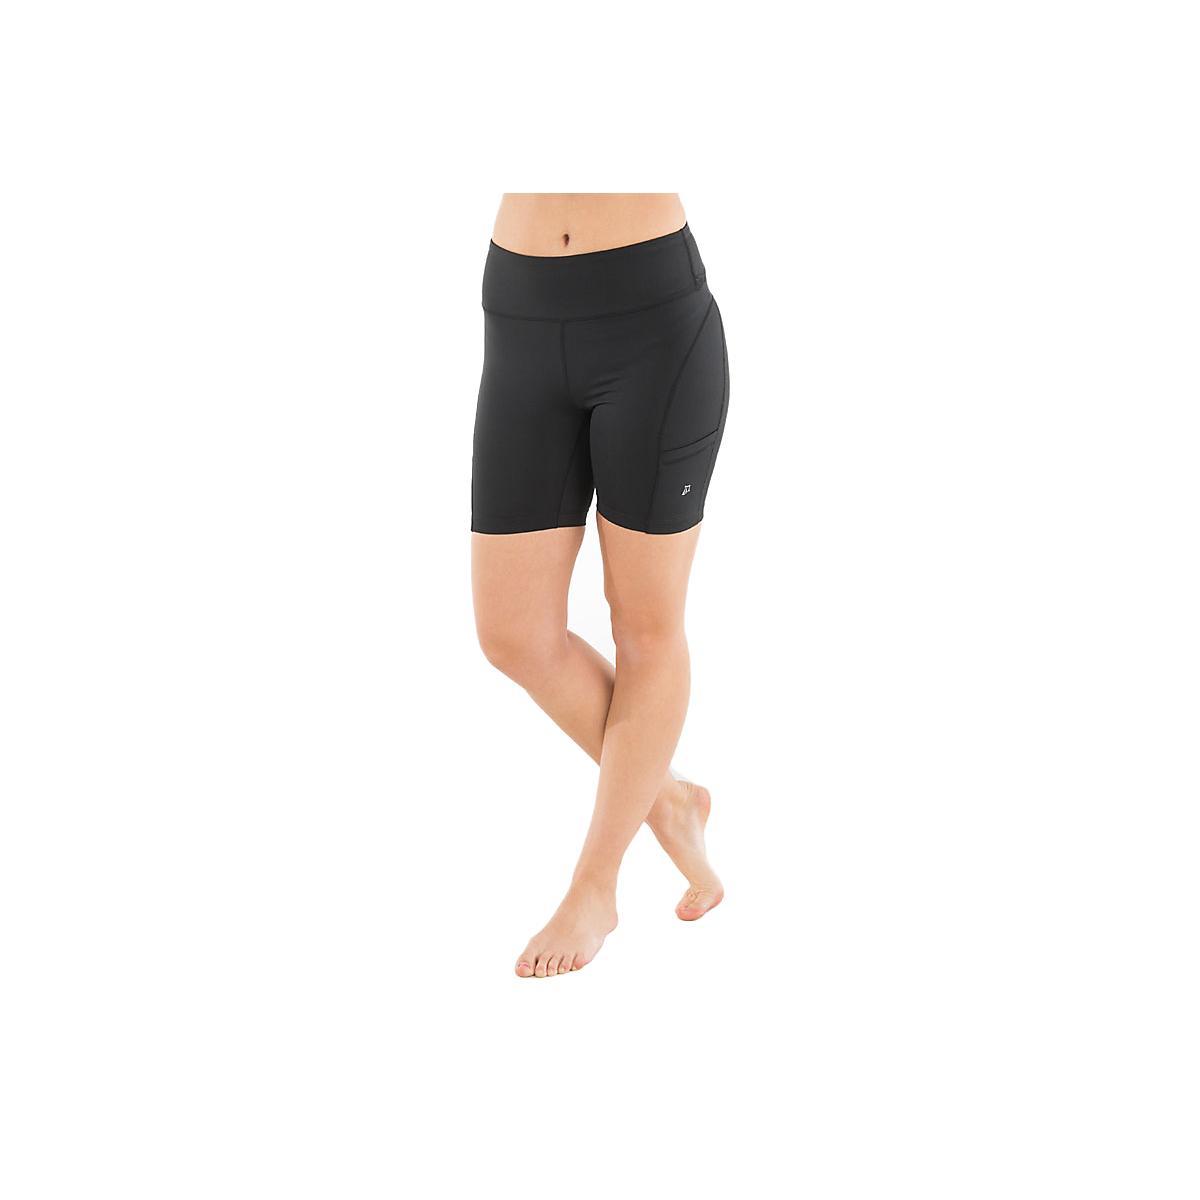 Women's Skirt Sports�Redemption Shorties